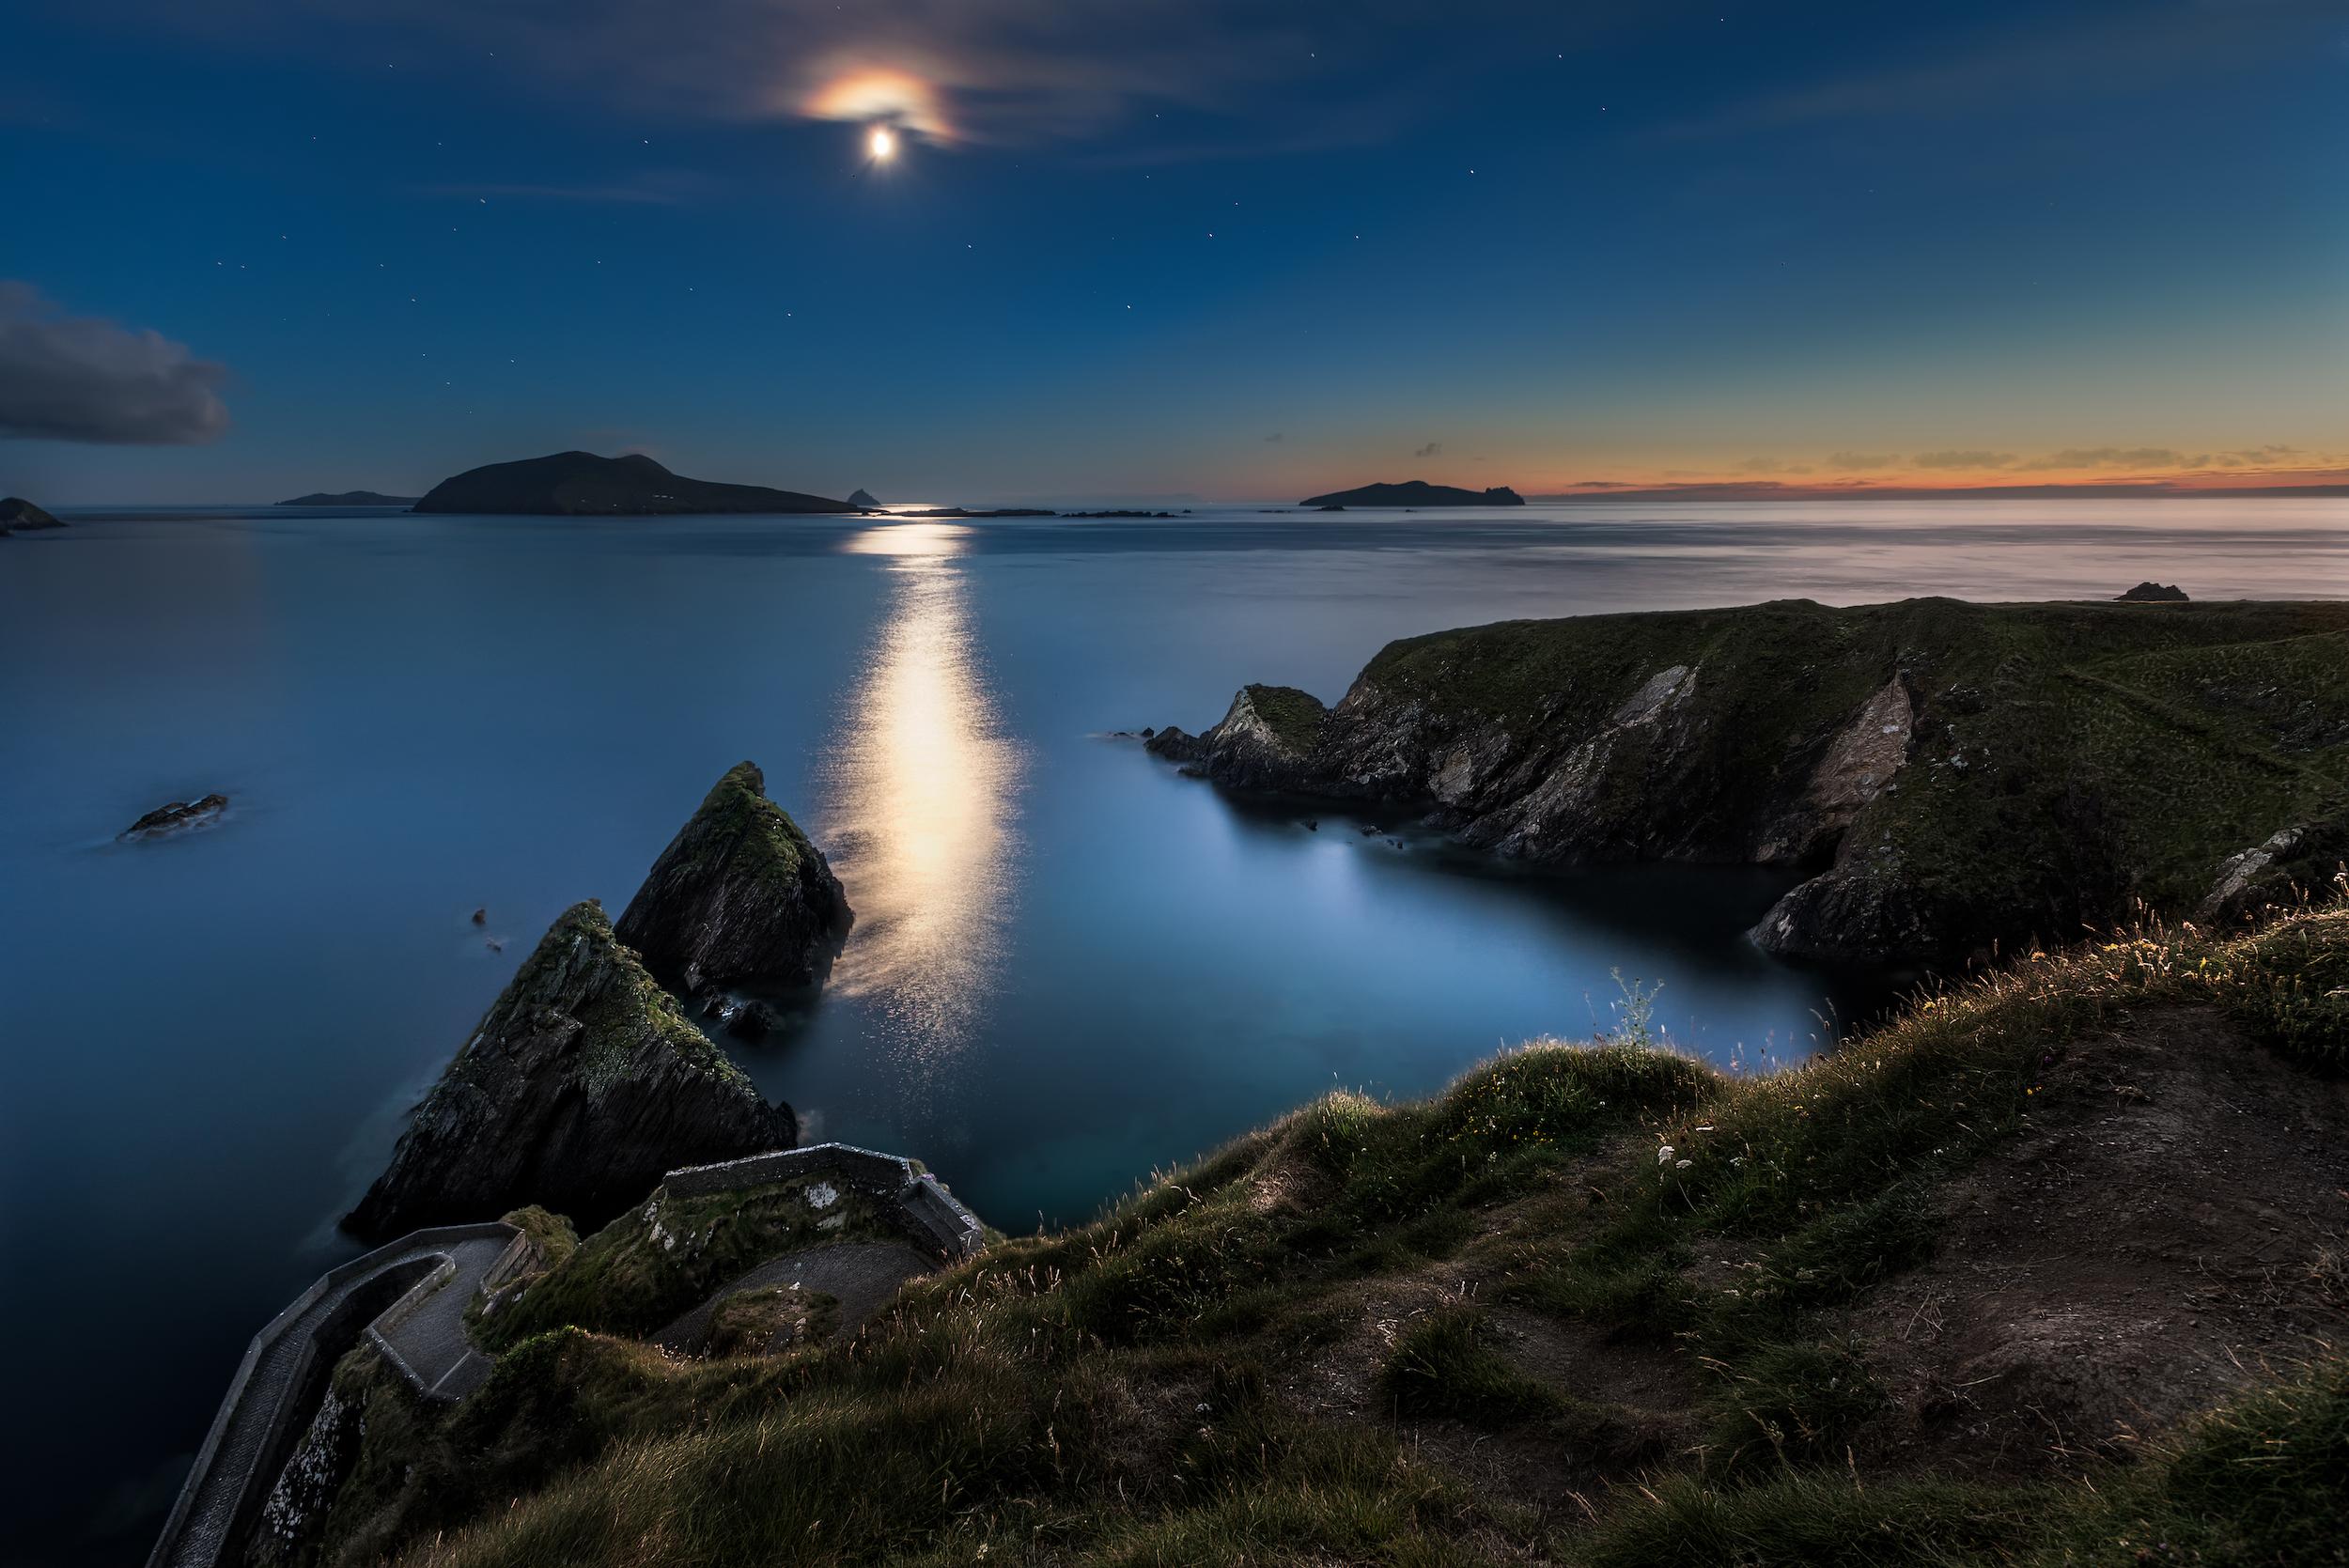 Moonshine at Dunquin Pier, Ireland at midnight in July.